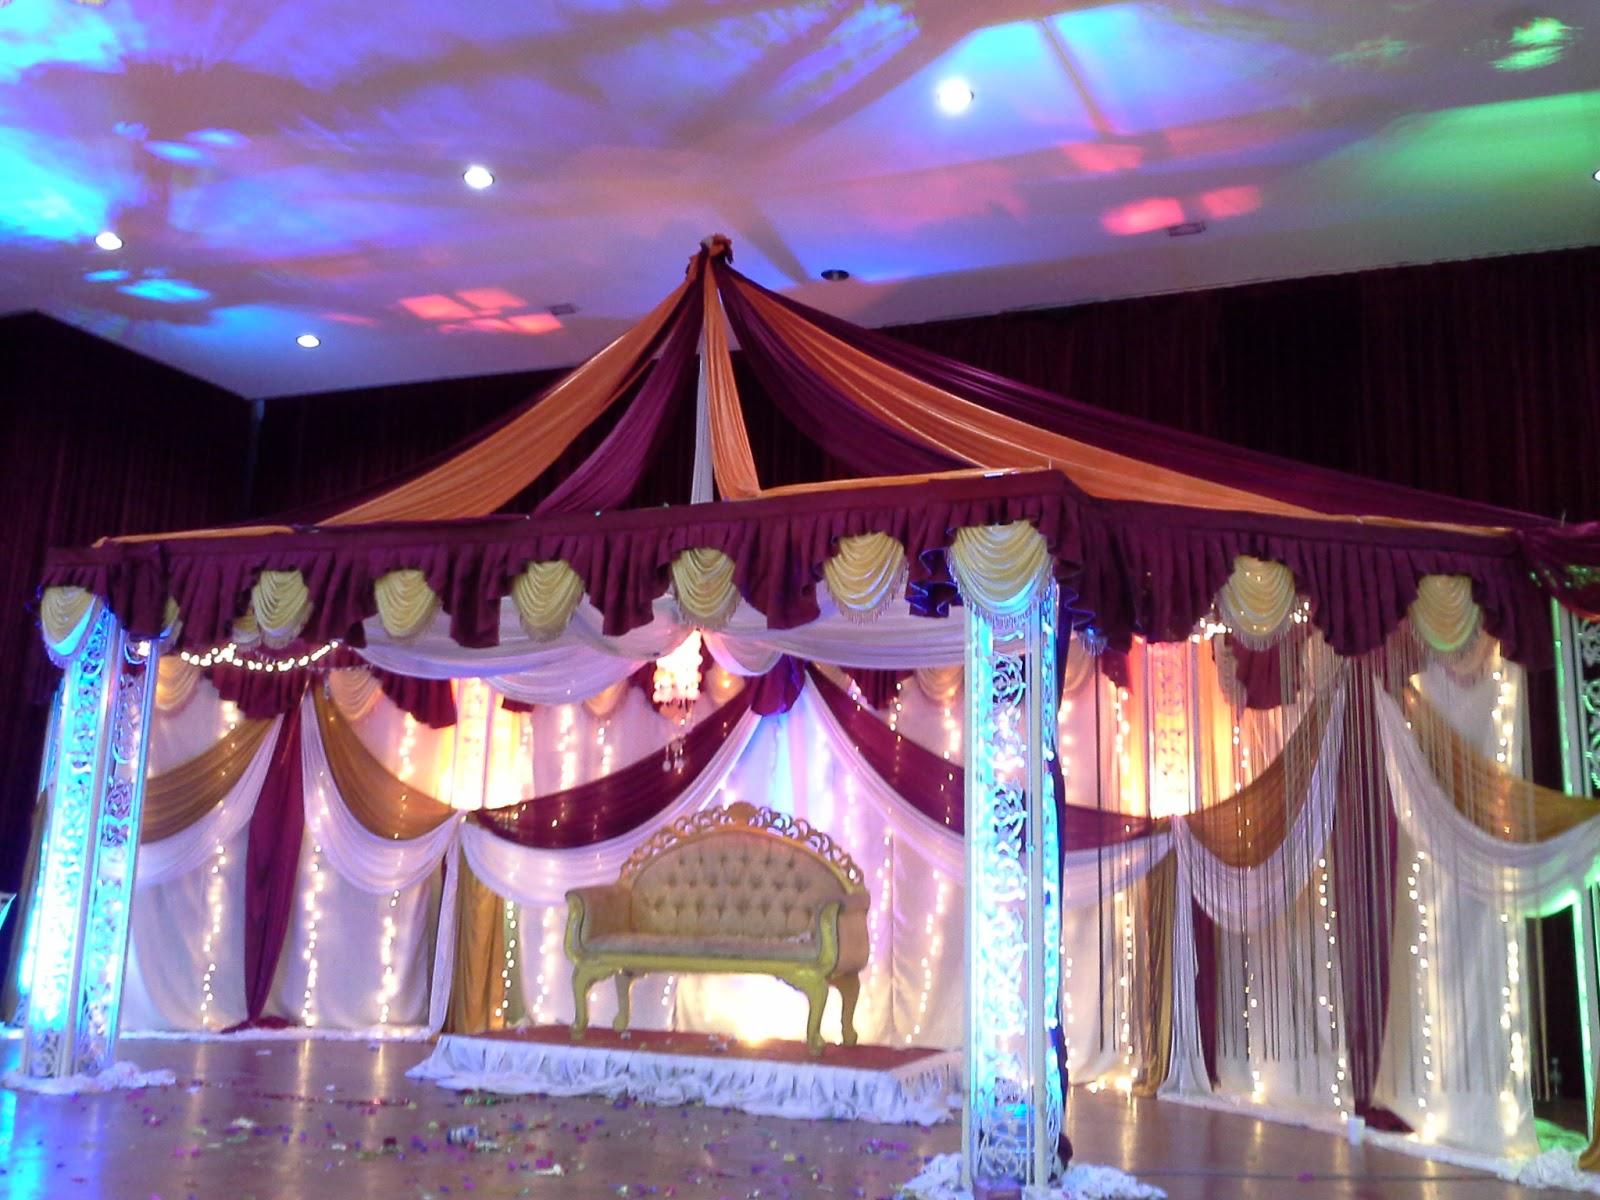 Kisha mega events indian wedding manavarai by kisha indian wedding manavarai by kisha junglespirit Gallery